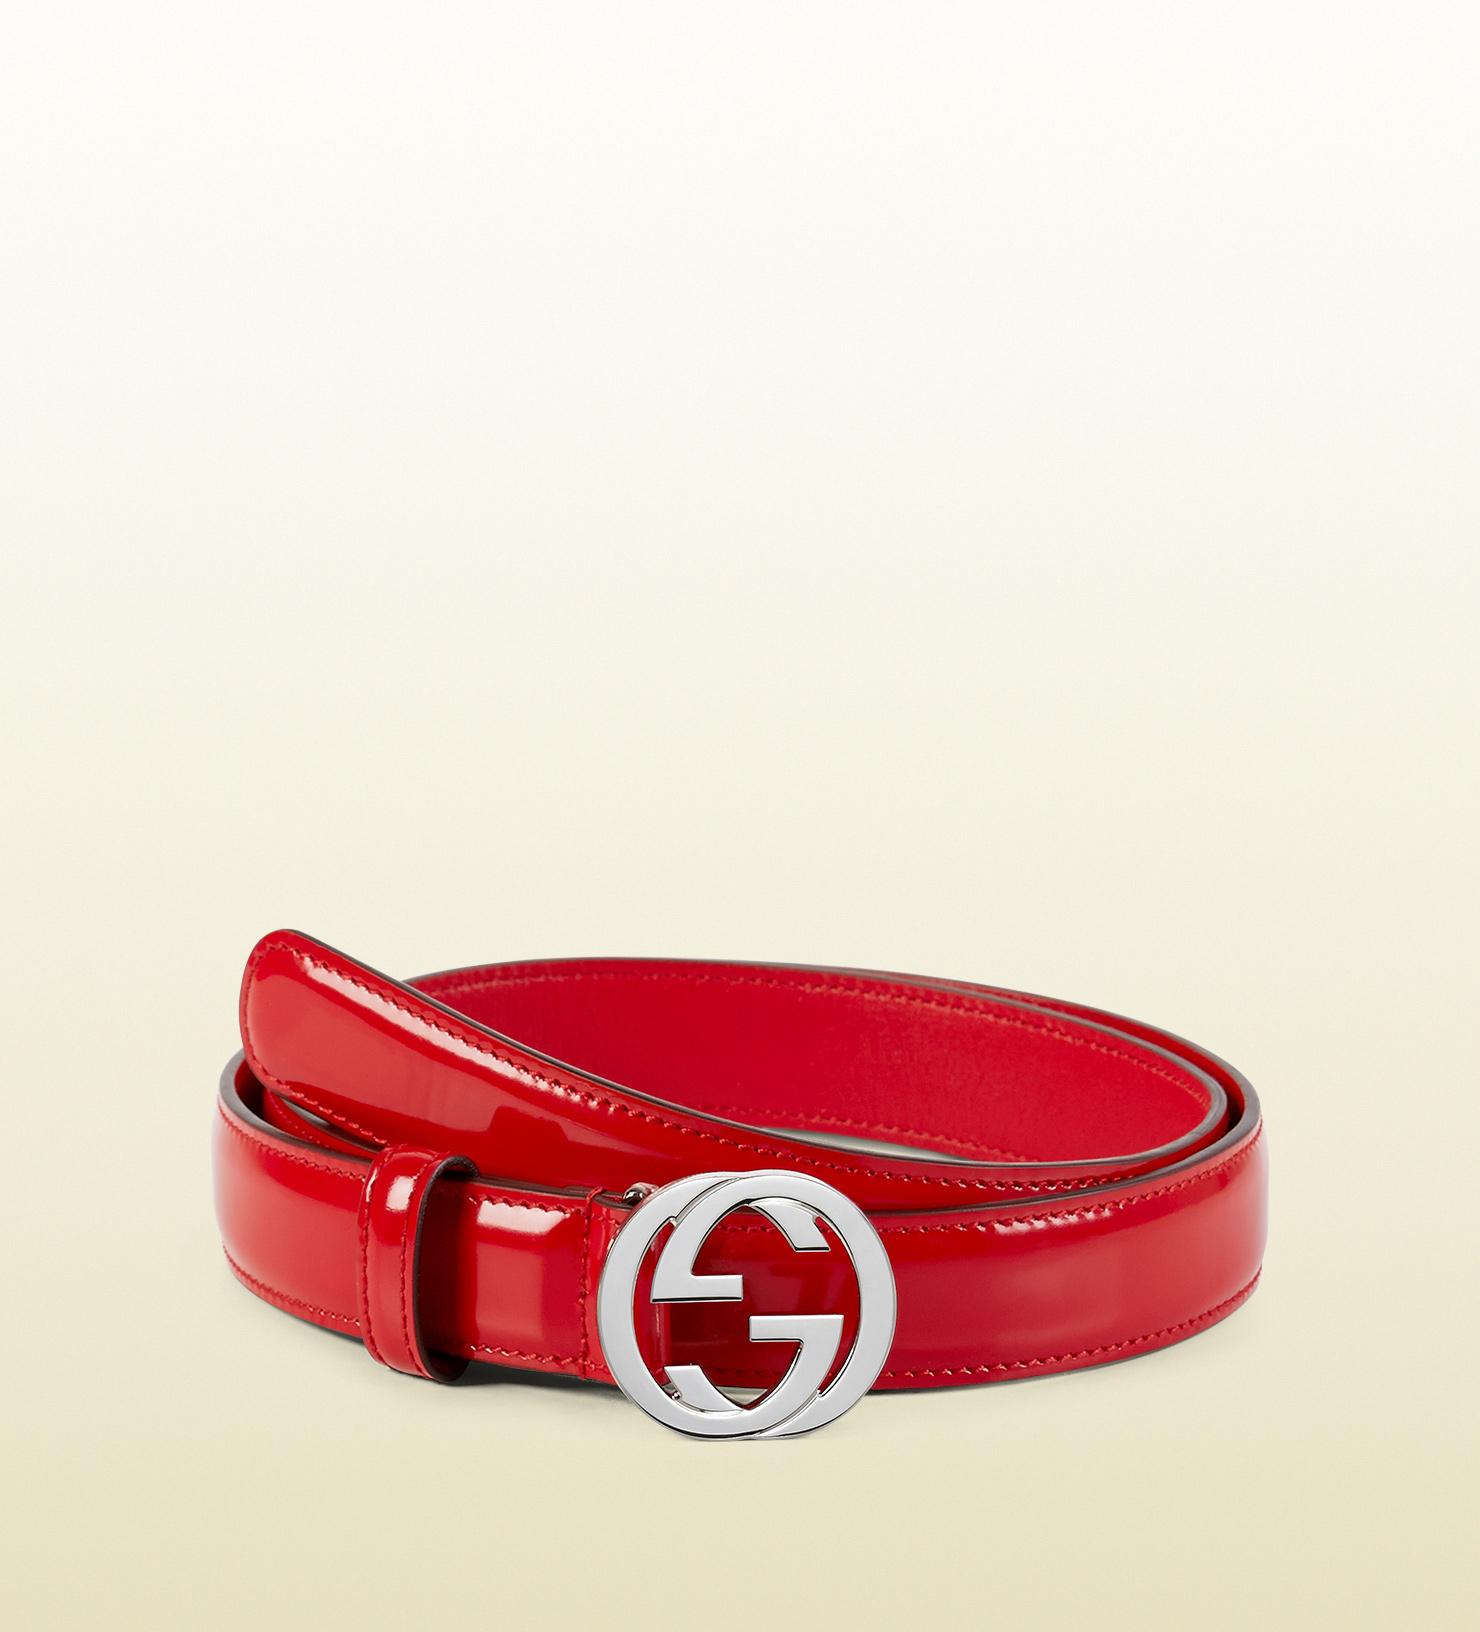 Mcm Belt | Red Gucci Belt | Blue and Red Gucci Belt